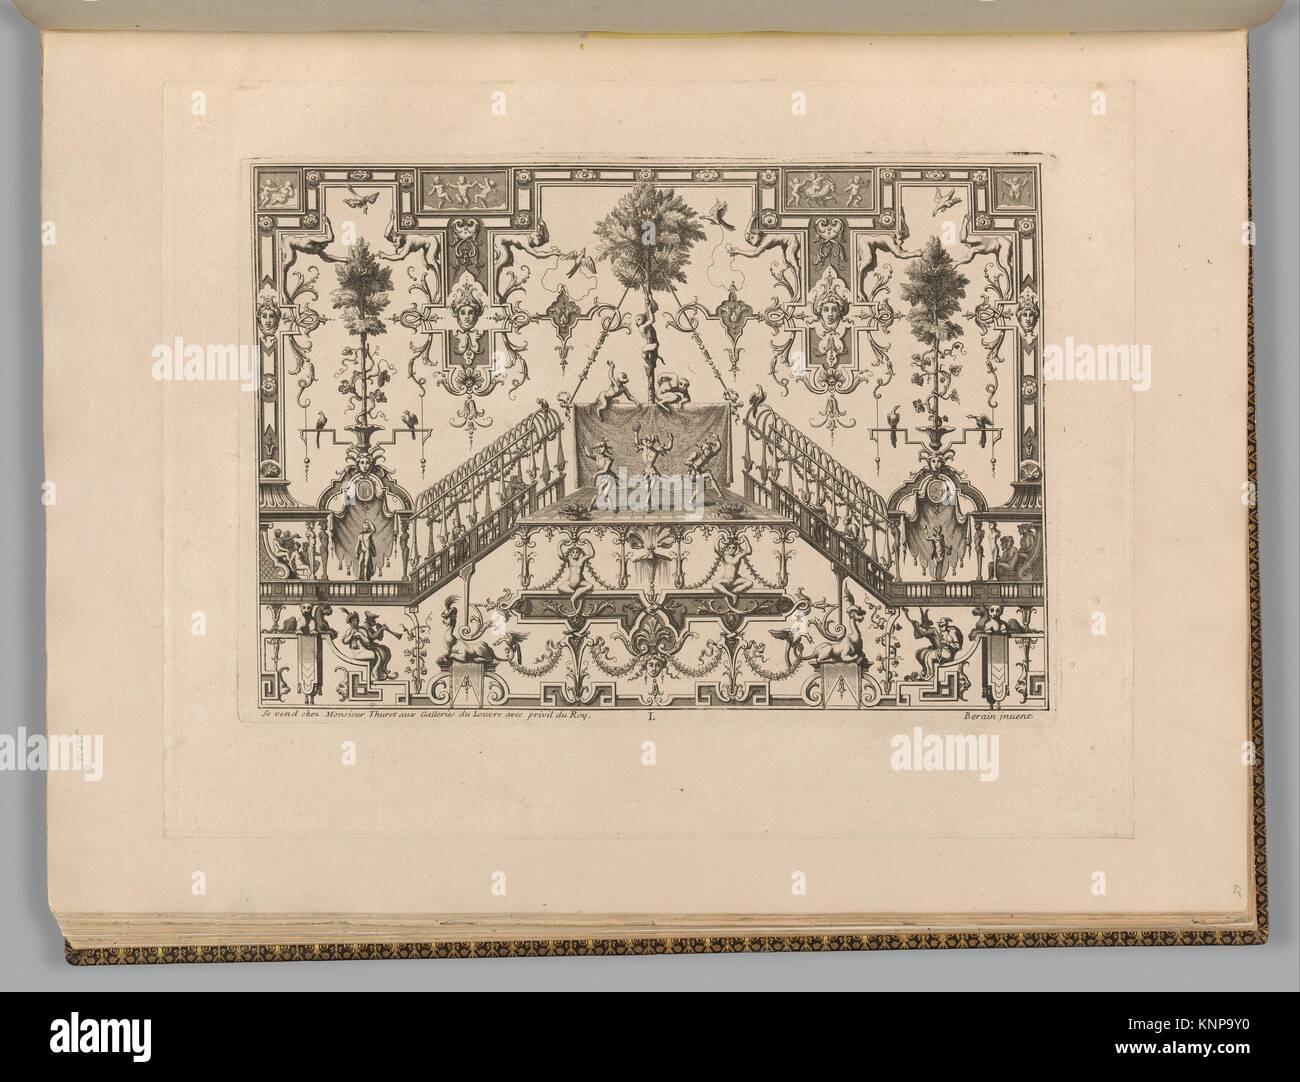 Ornament Designs Invented by J. Berain. Artist and publisher: Jean Berain (French, Saint-Mihiel 1640-1711 Paris); - Stock Image